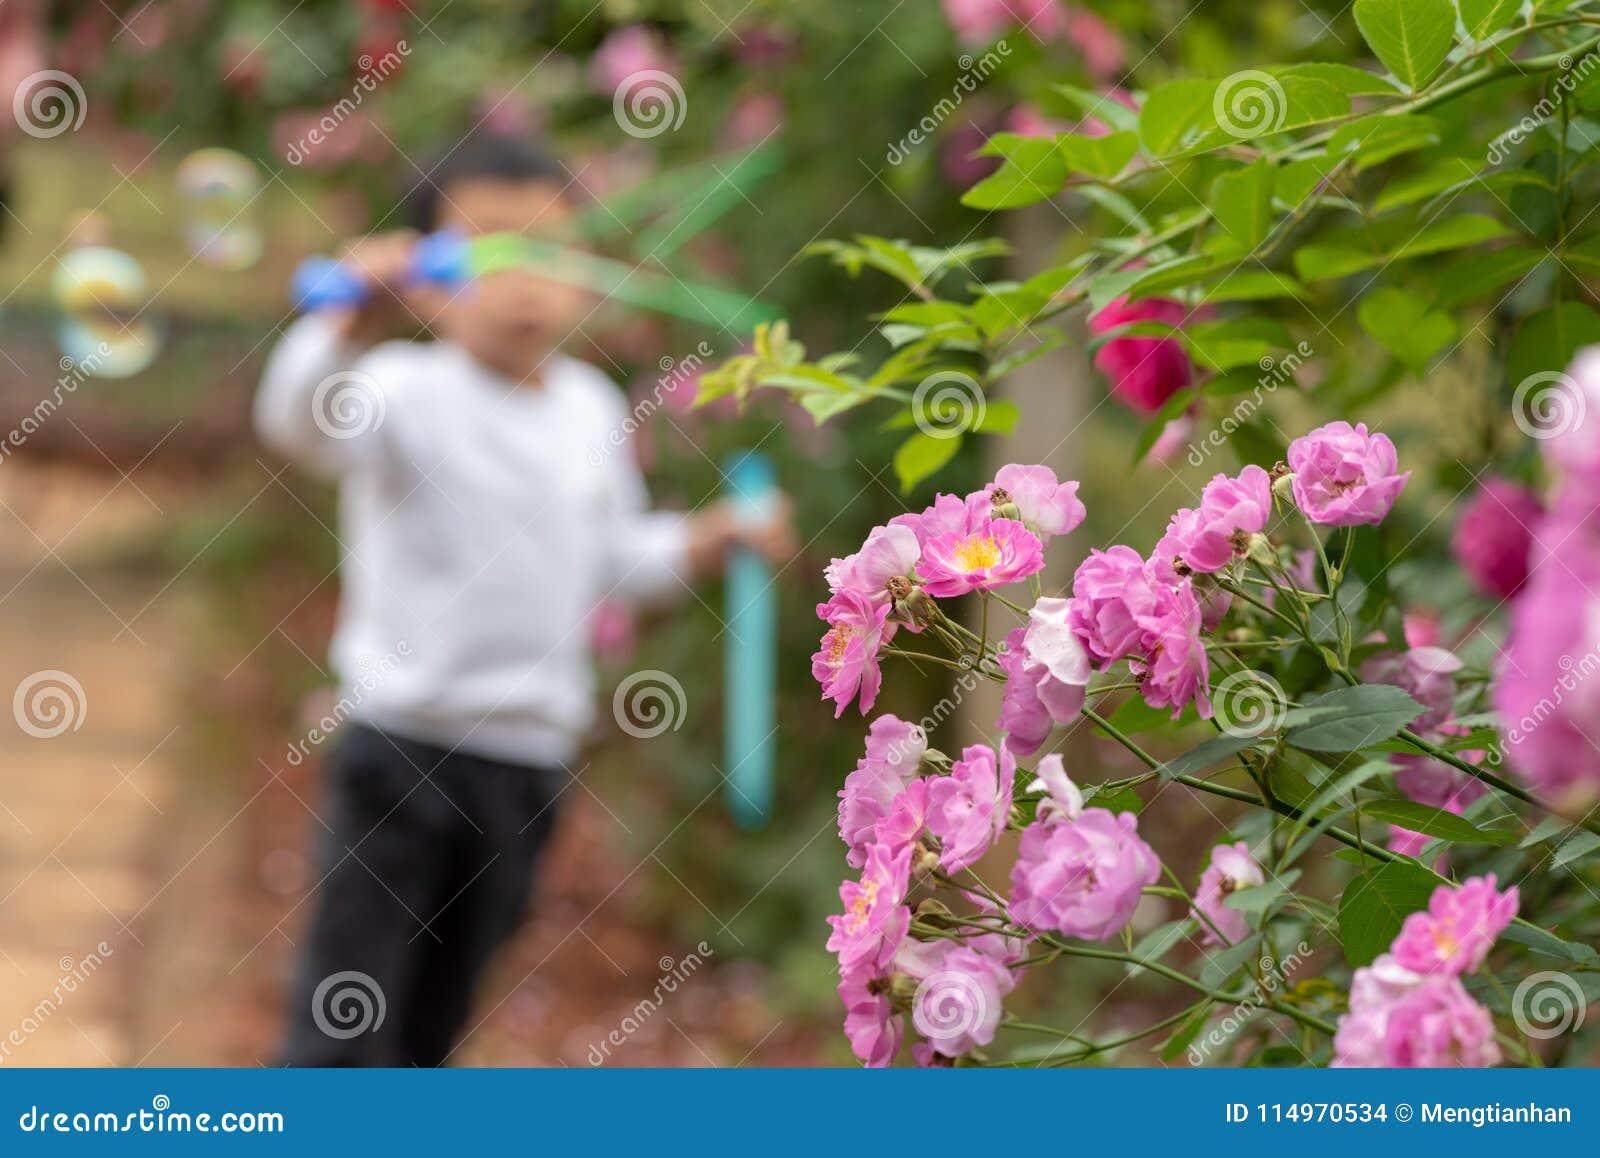 Hiver prune-Rosa Jacq chinensis